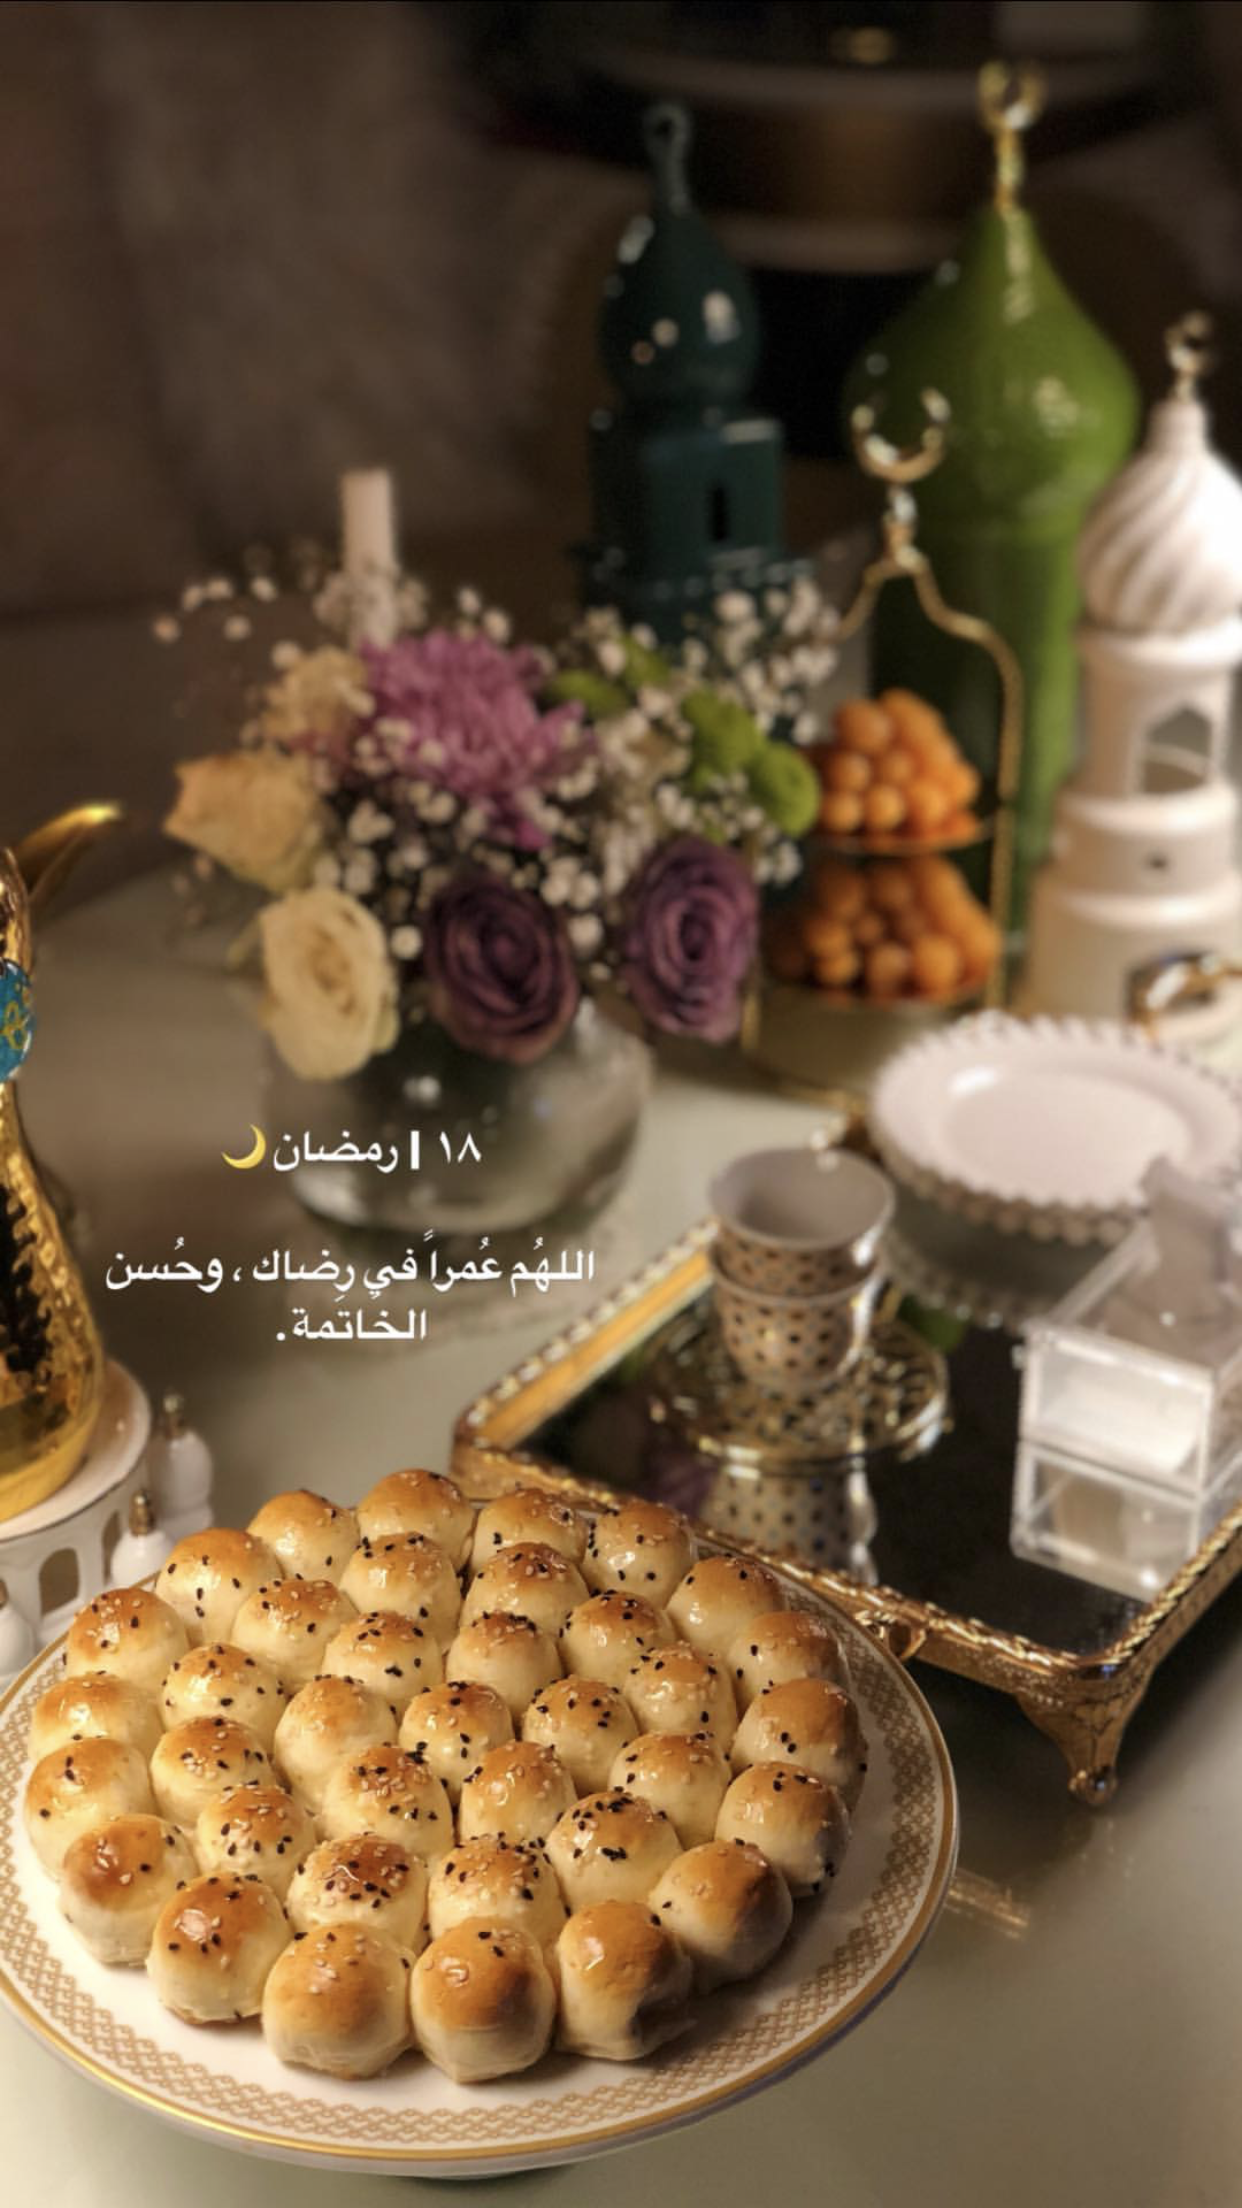 Pin By Ehsan On Arabic Food Snapchat Food Decoration Buffet Food